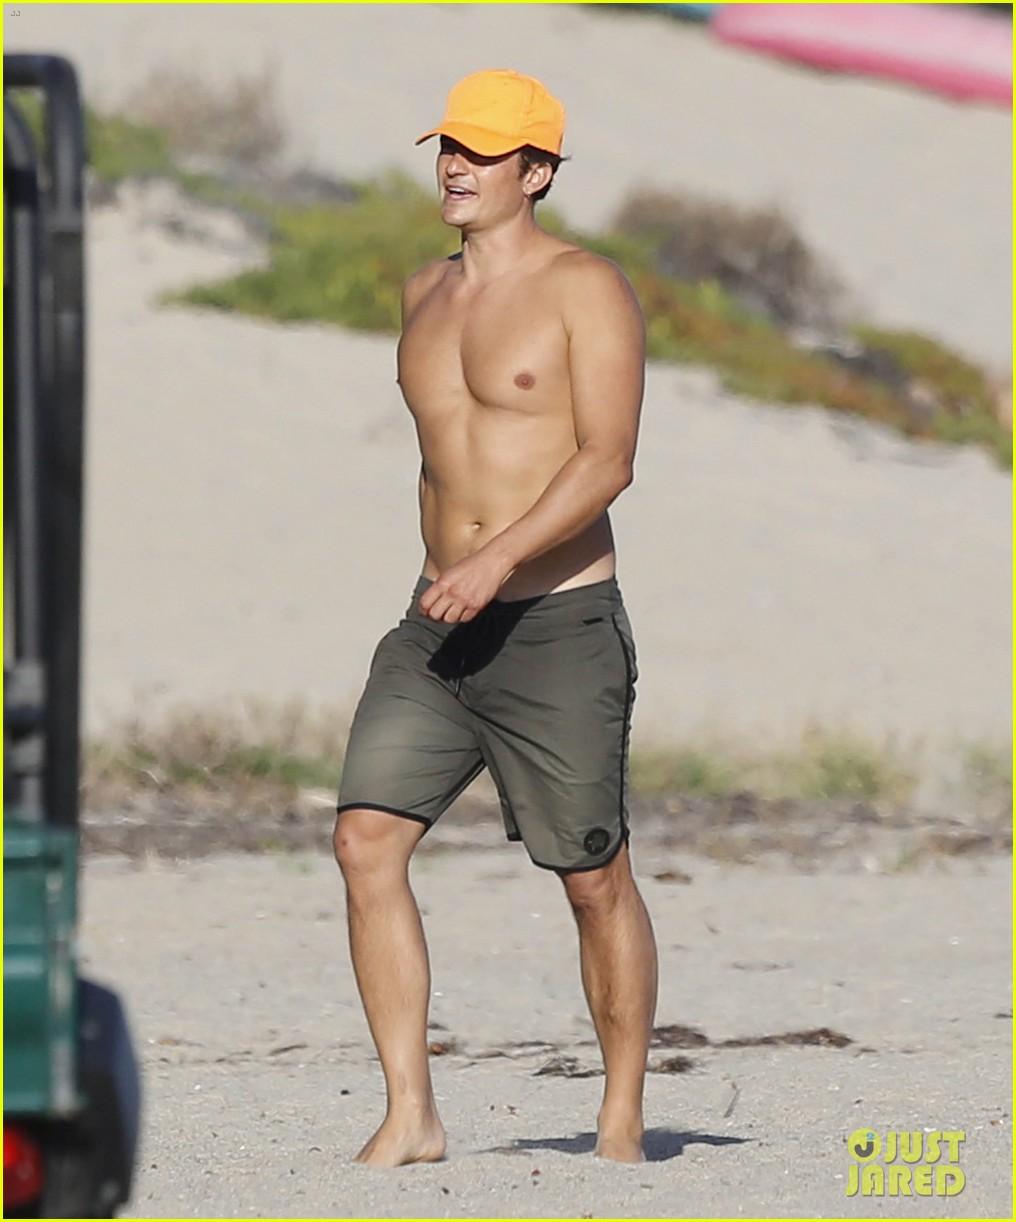 Full Sized Photo of orlando bloom shirtless malibu beach 12   Photo 3476944   Just Jared